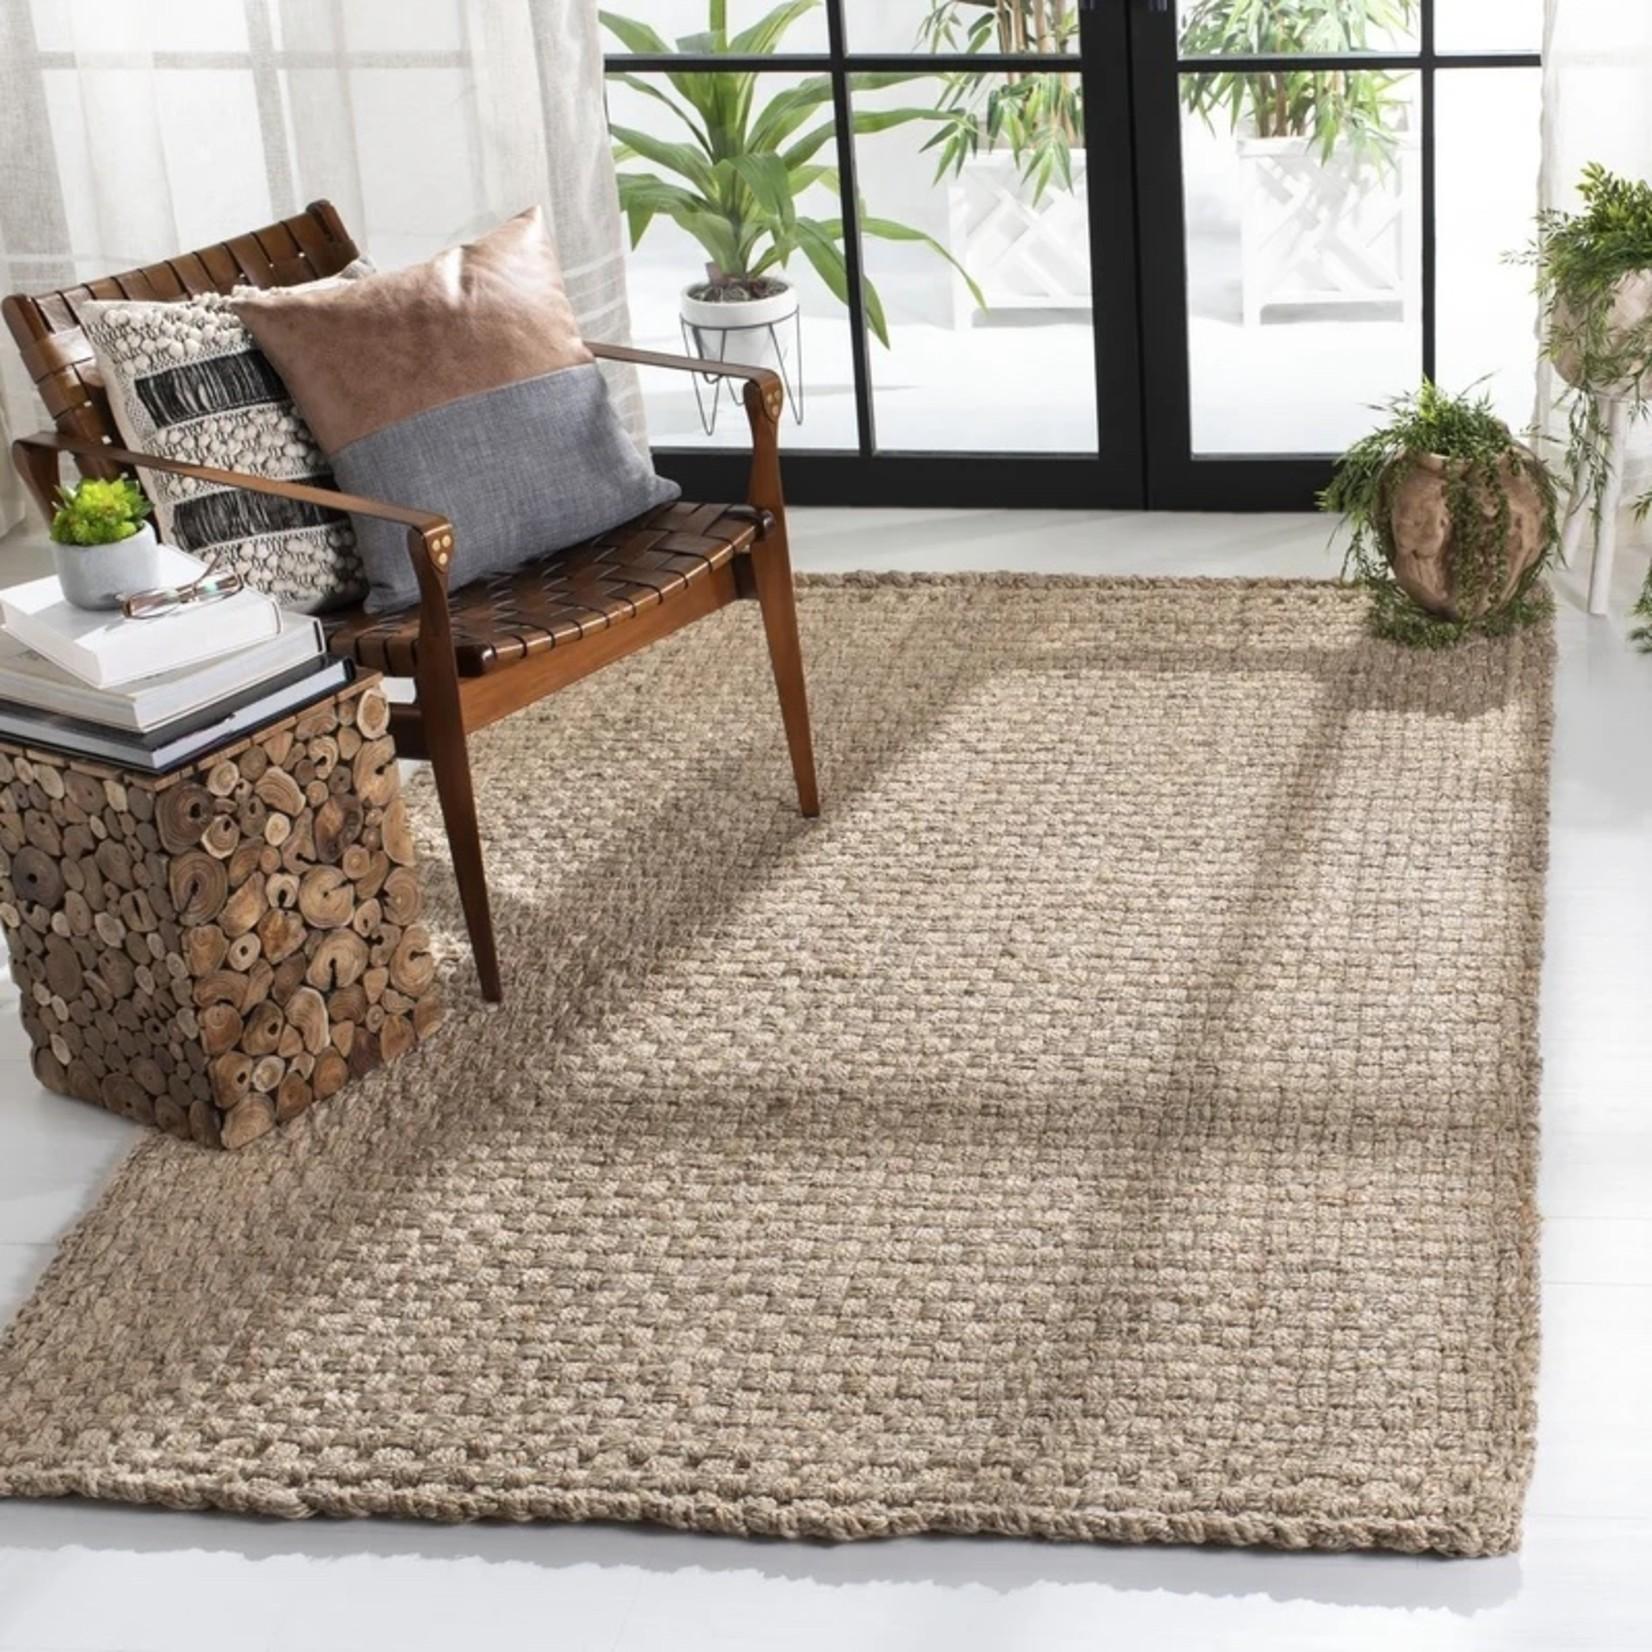 *5' x 8' - Rockport Handmade Flatweave Brown Area Rug